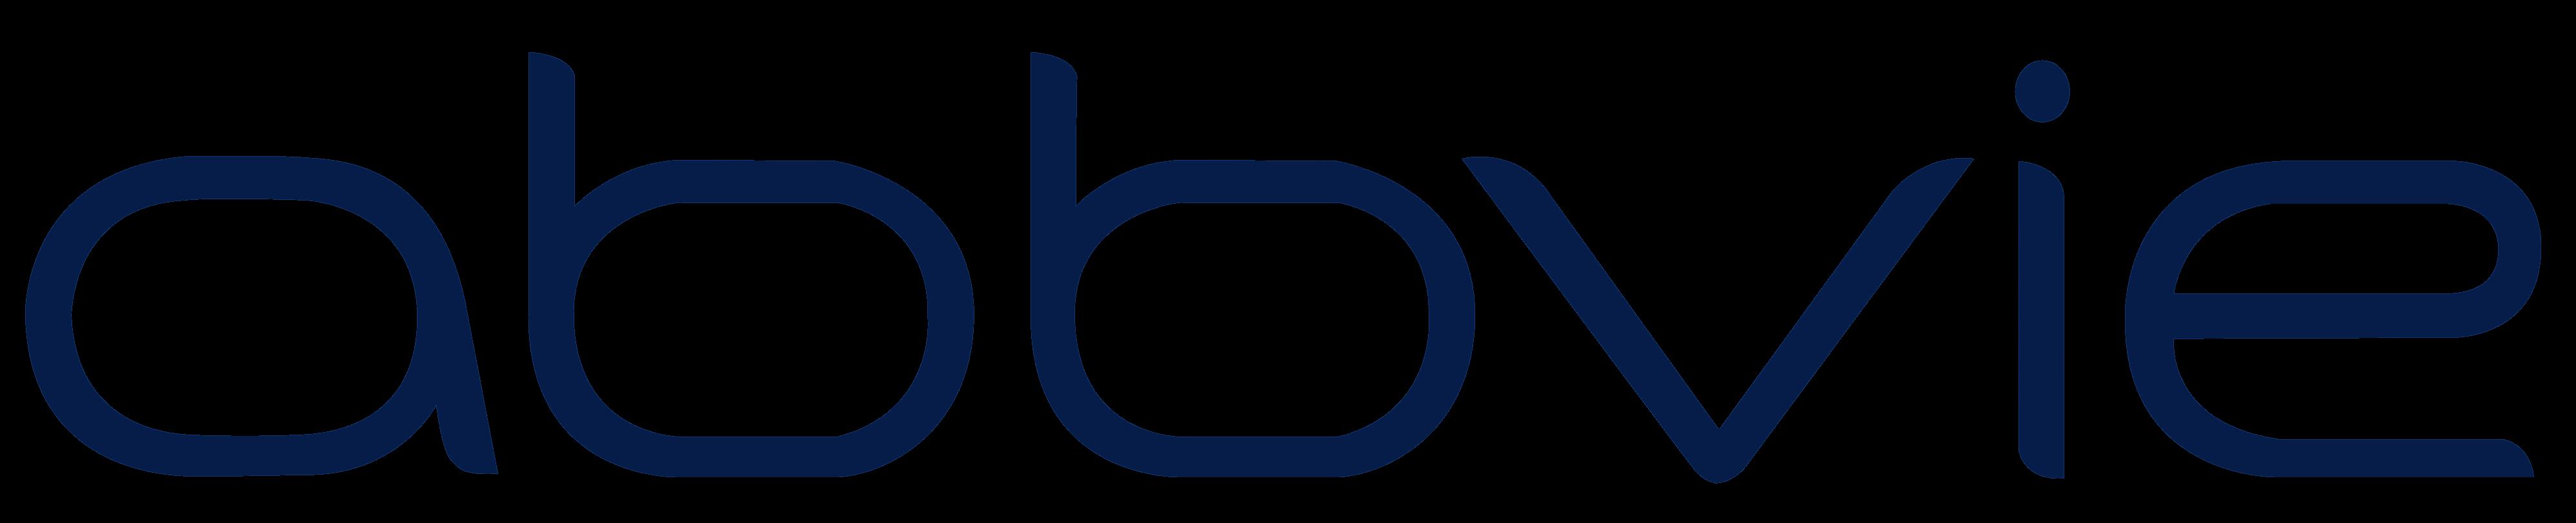 logo - abbvie - 01